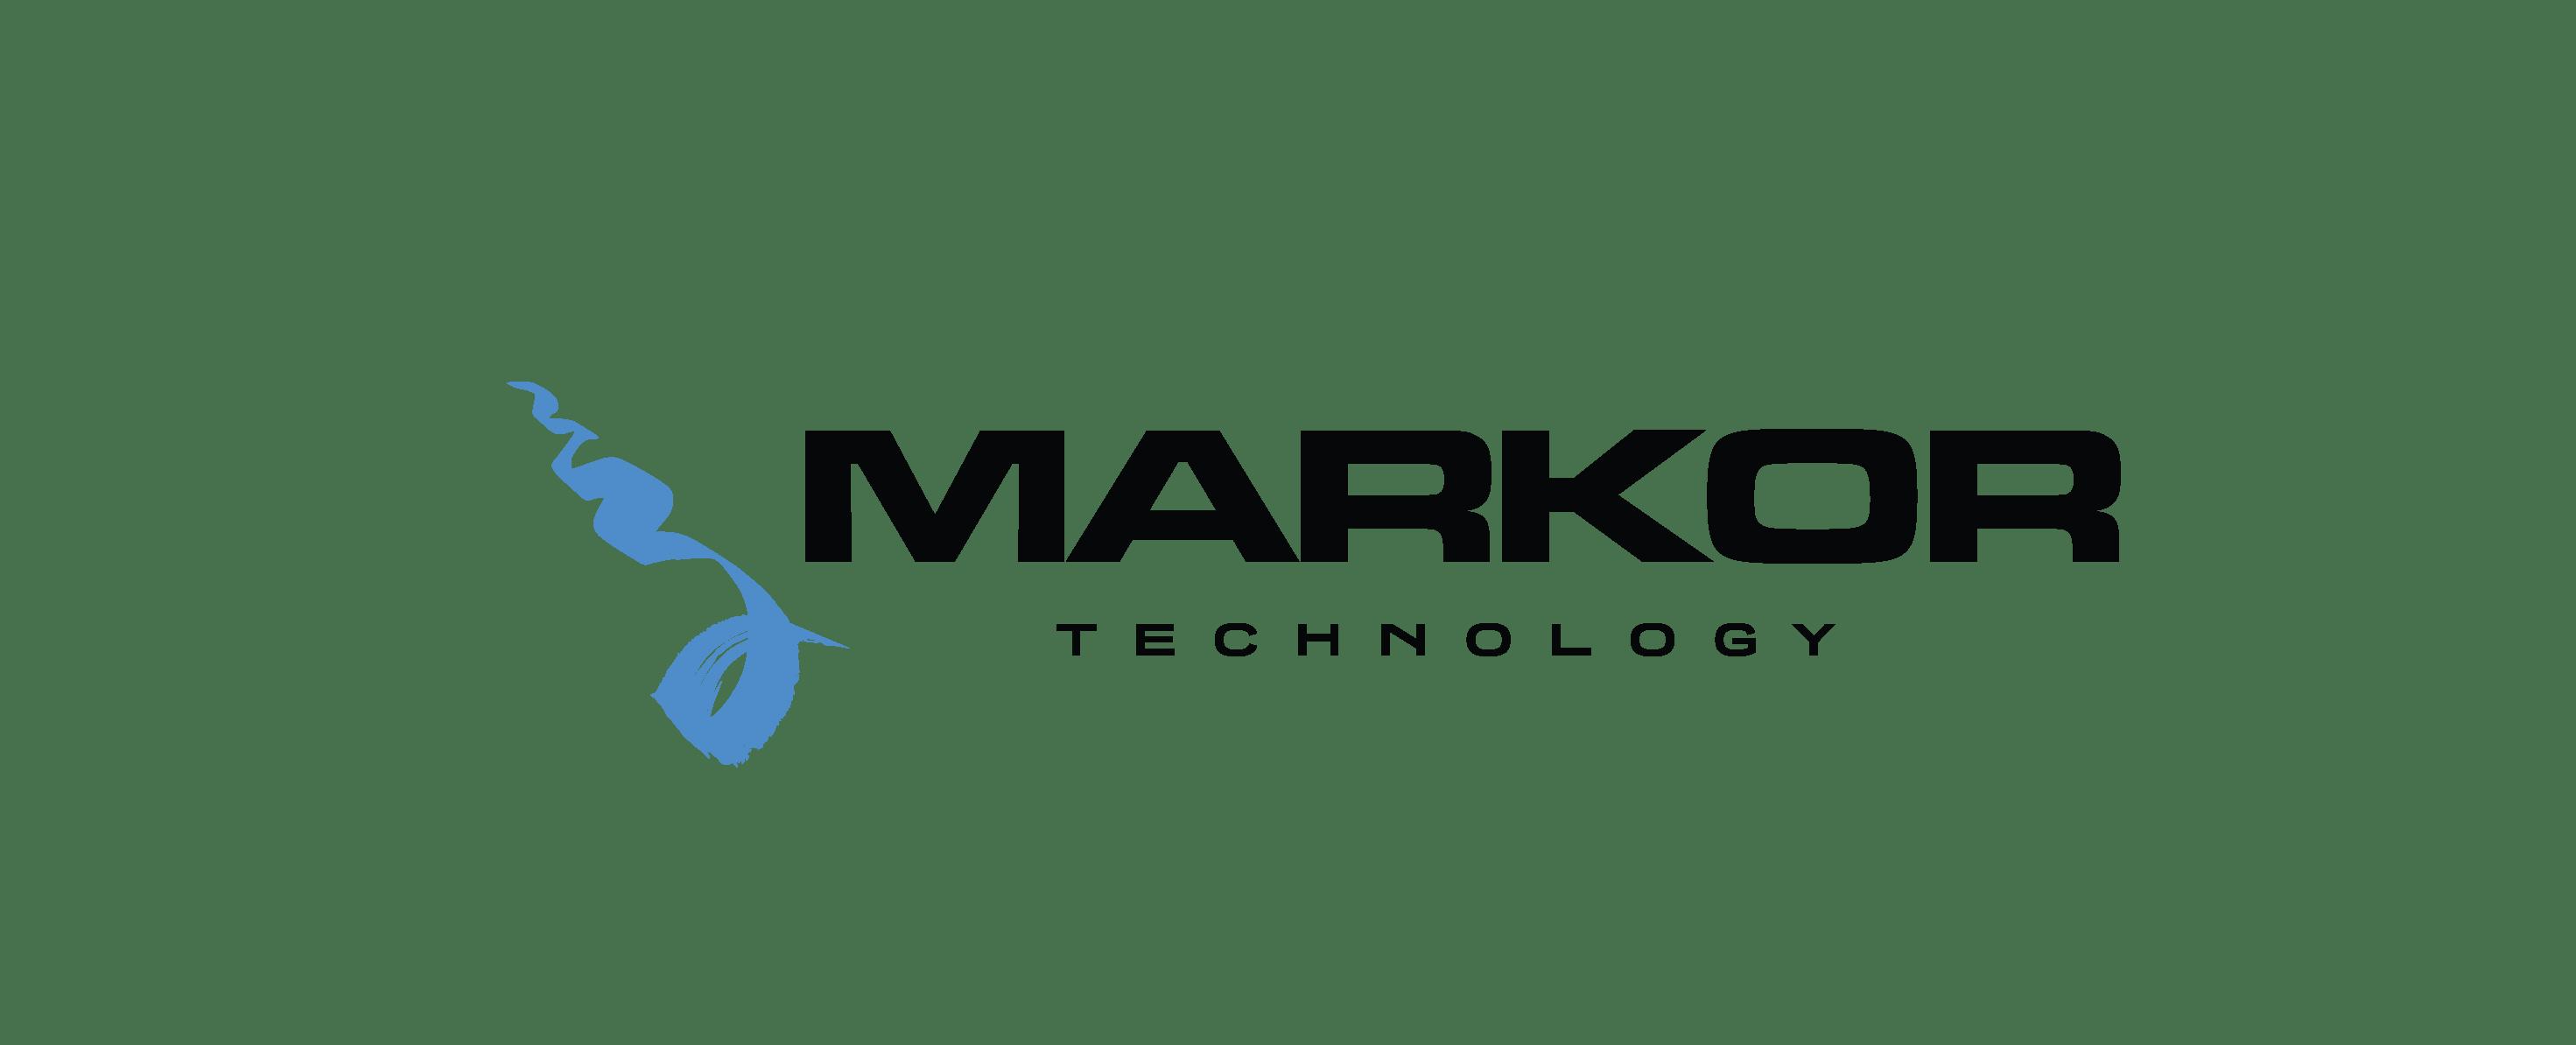 Markor Technology Spiele